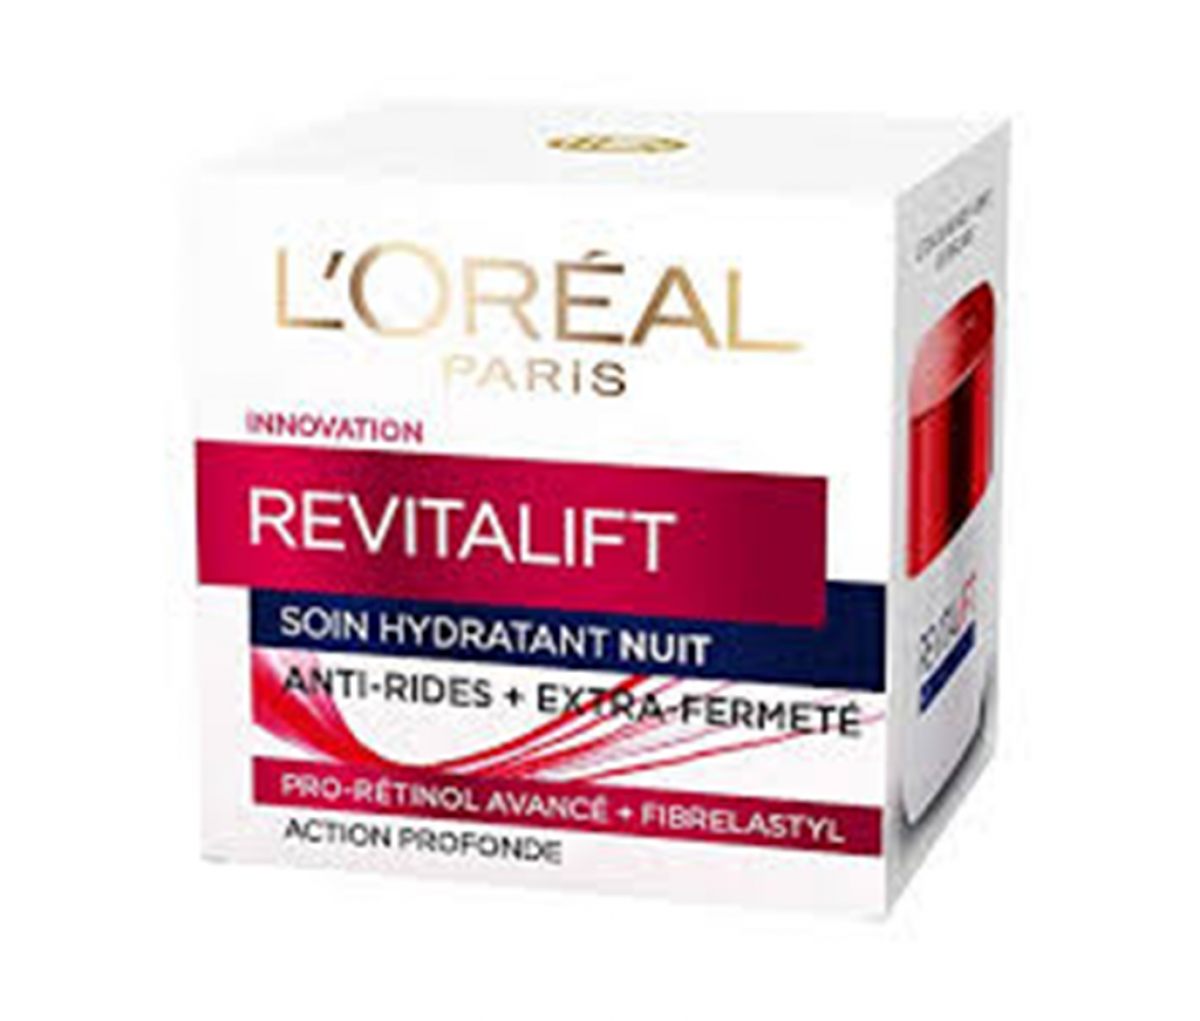 L'Oreal  Revitalift Soin De Jour Hydrant Day